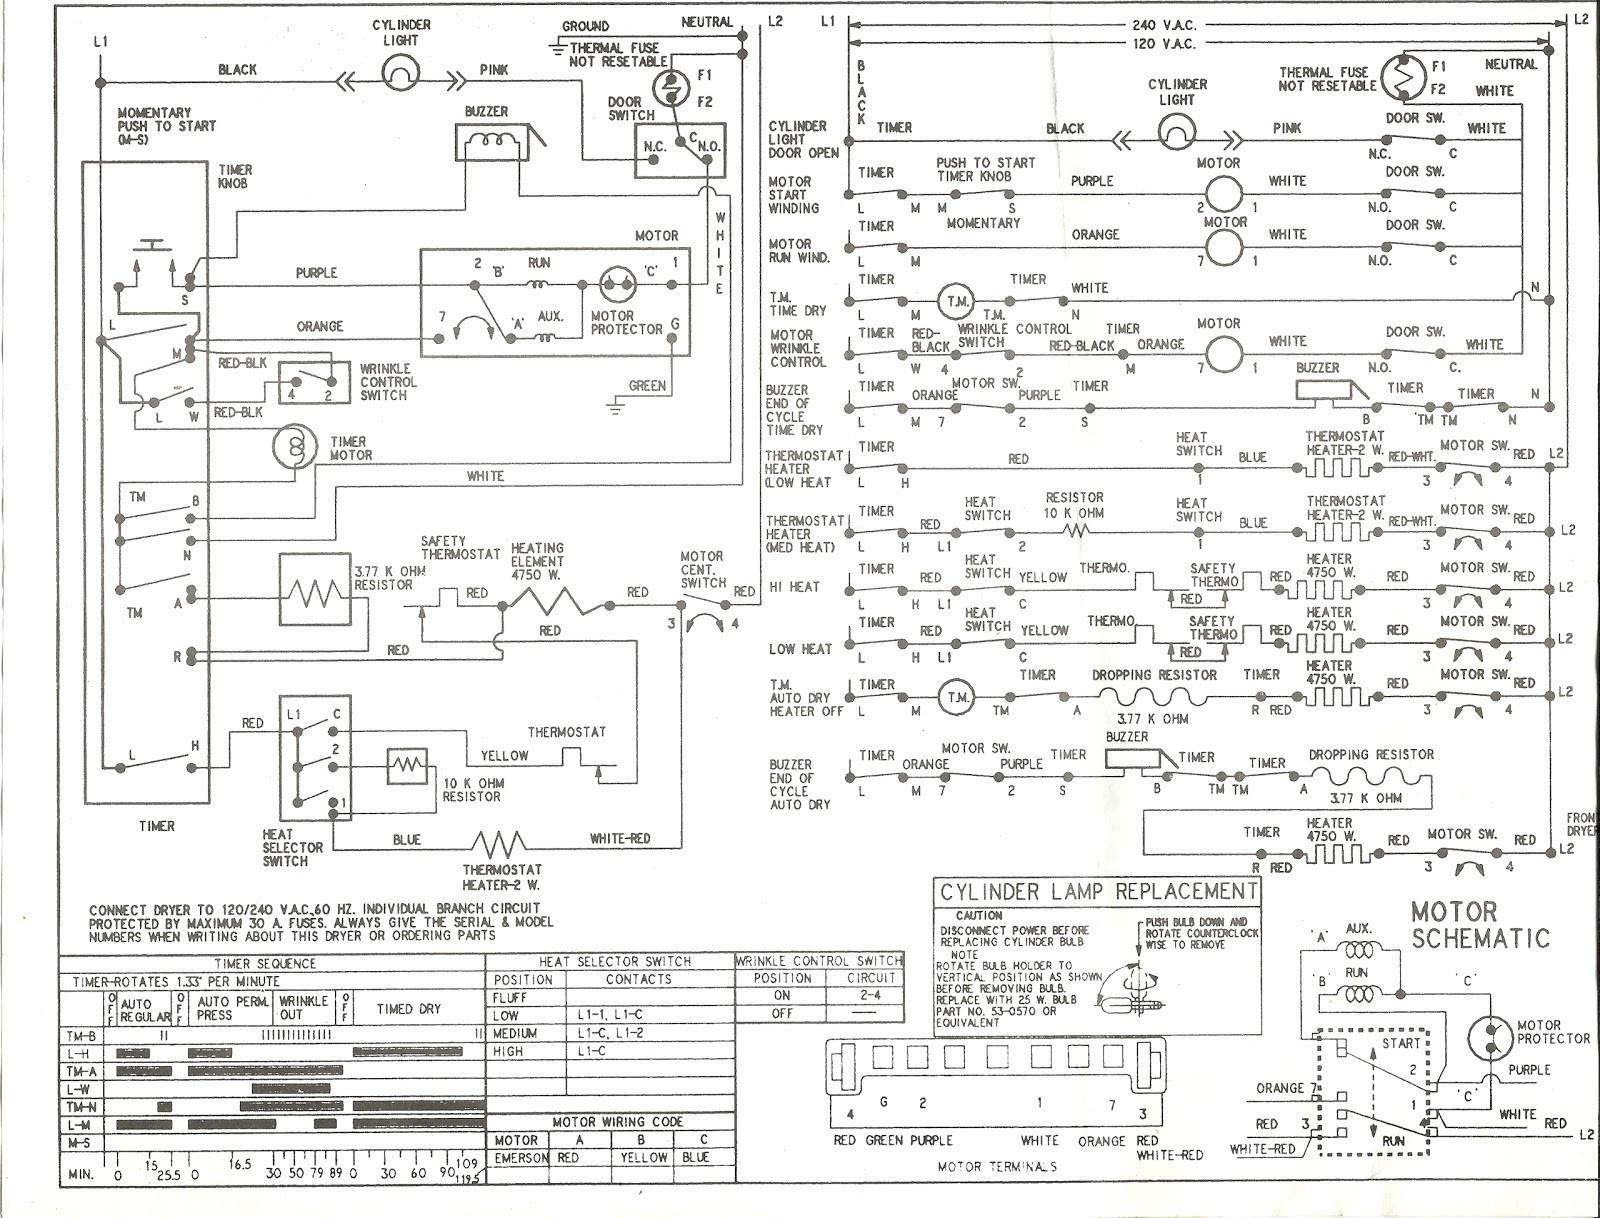 Kenmore Dryer Wiring Diagram 220 - Wiring Diagrams - Kenmore Dryer Wiring Diagram